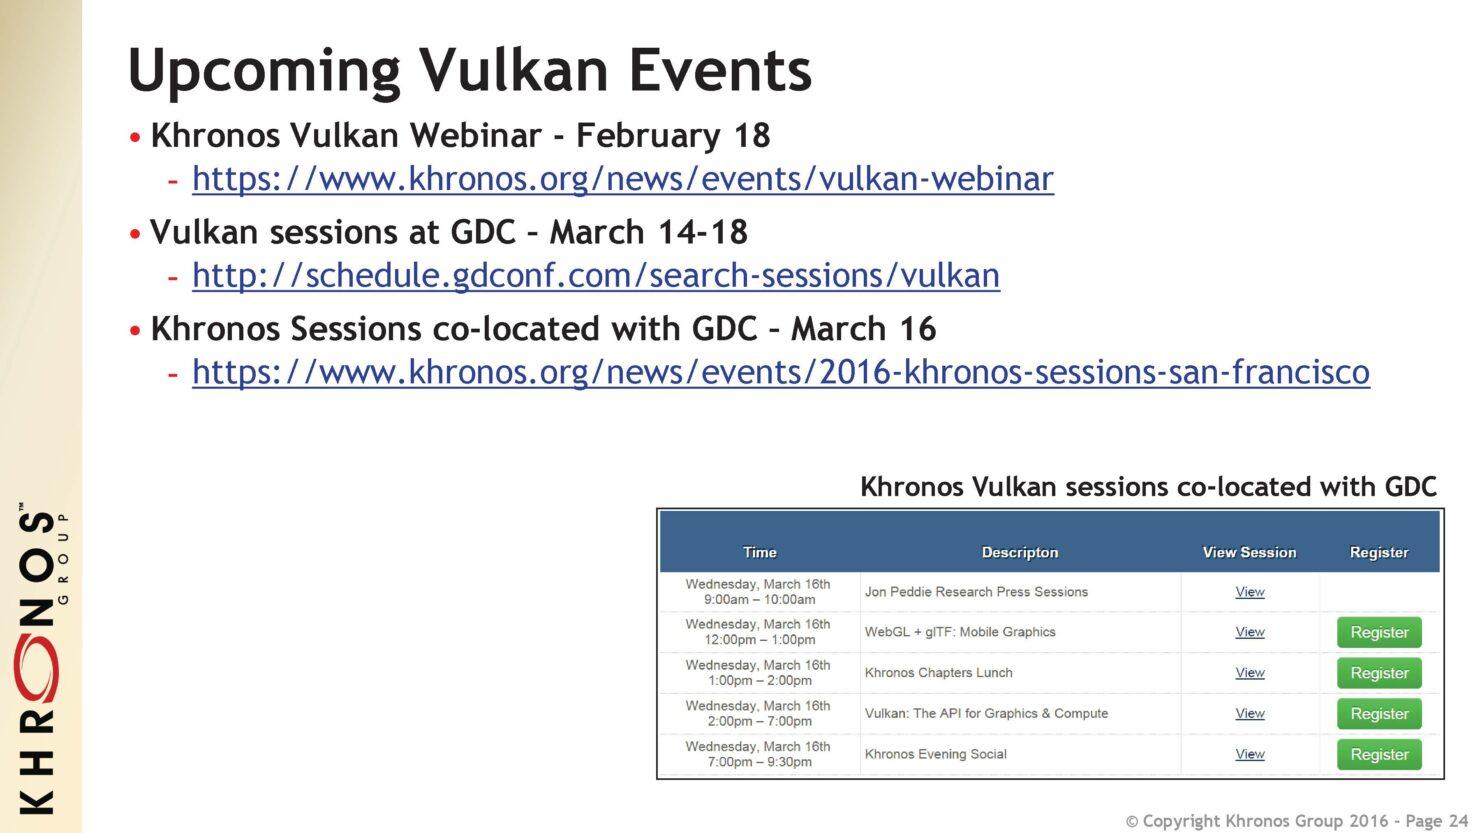 vulkan-api-1-0-launch-day-briefing-24